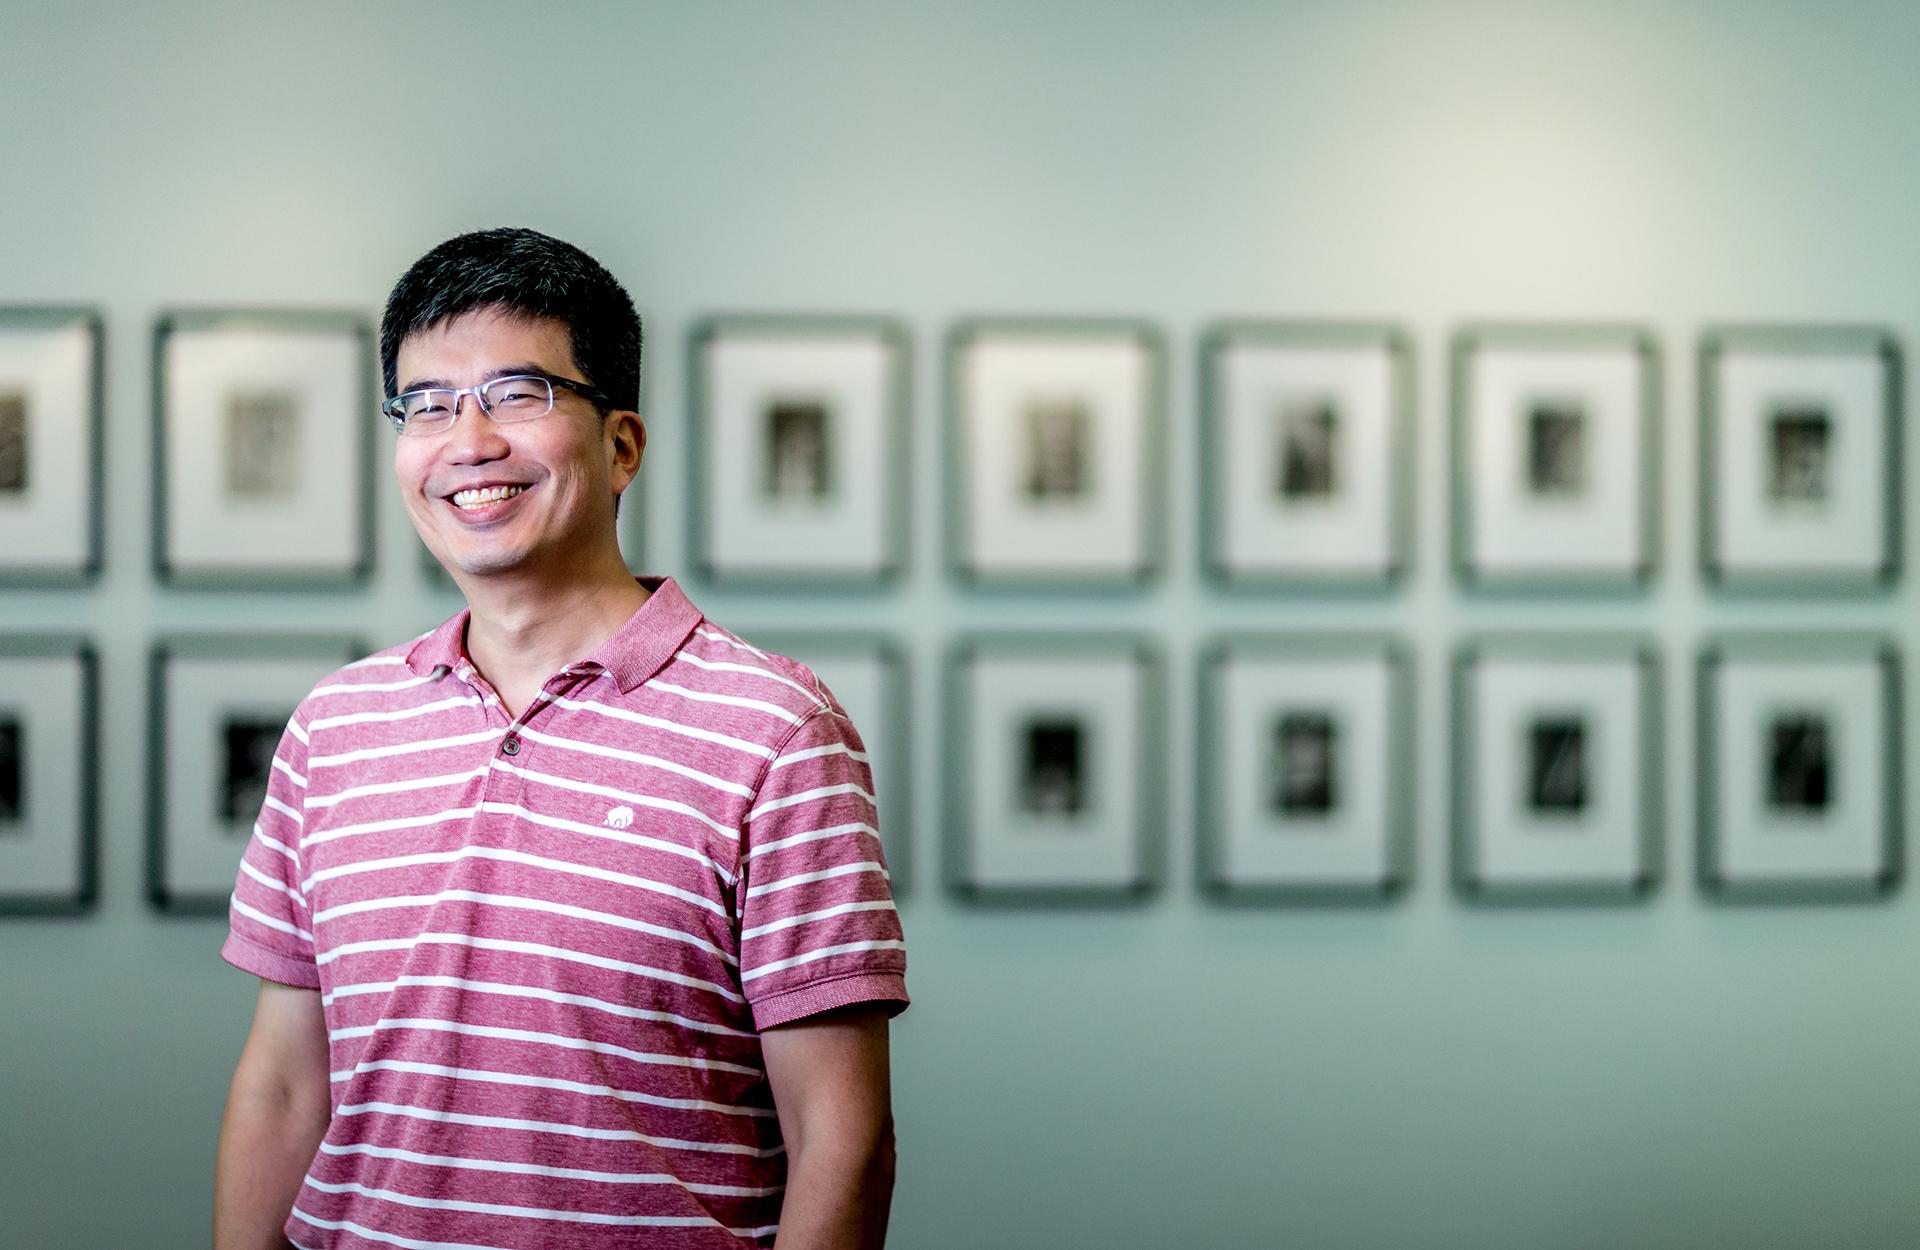 Microsoft's David Chiou